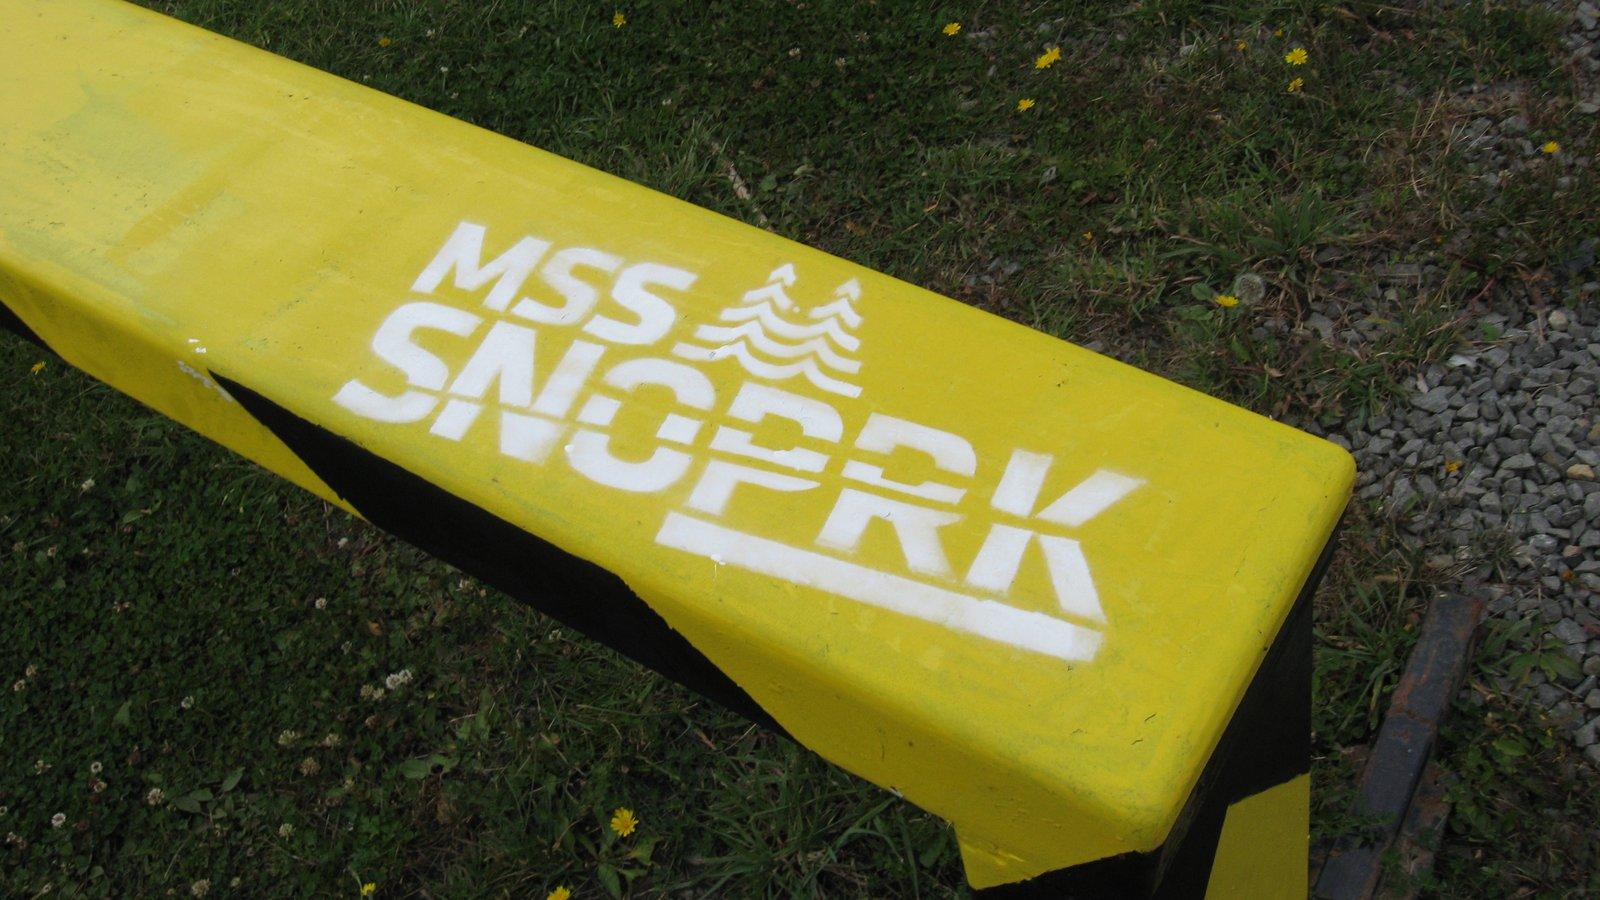 Park tag